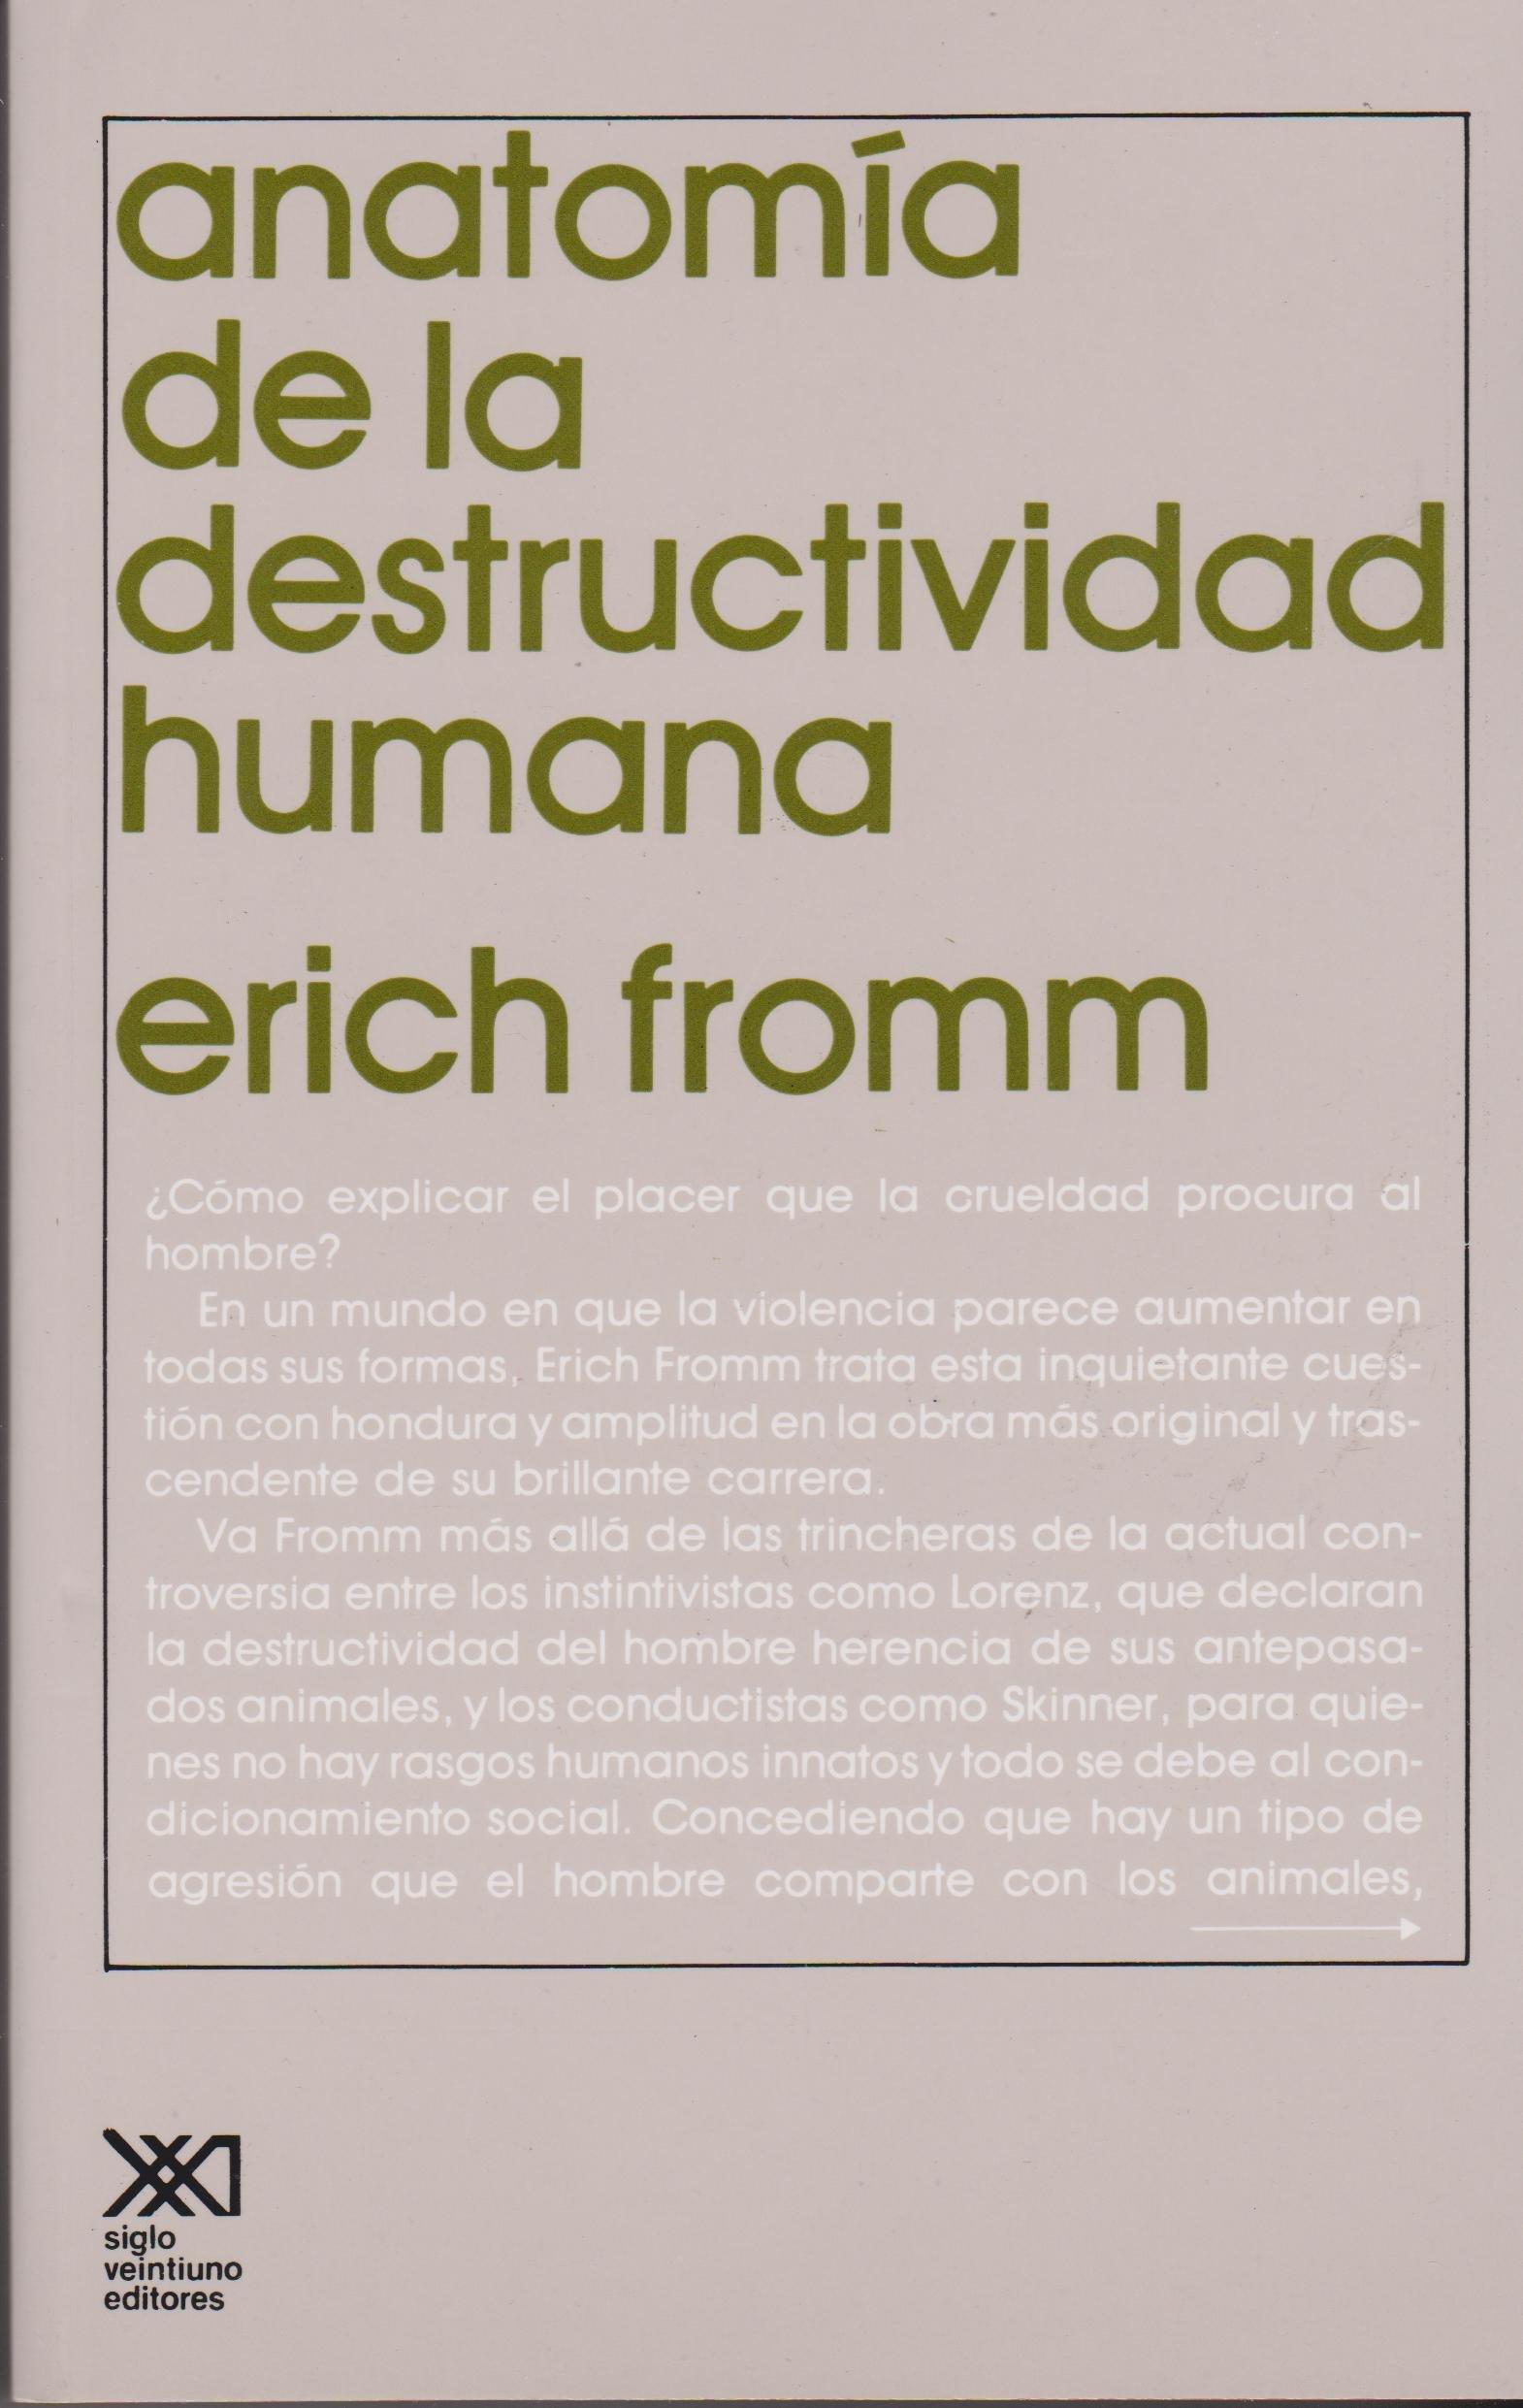 anatomia de la destructividad humana erich fromm